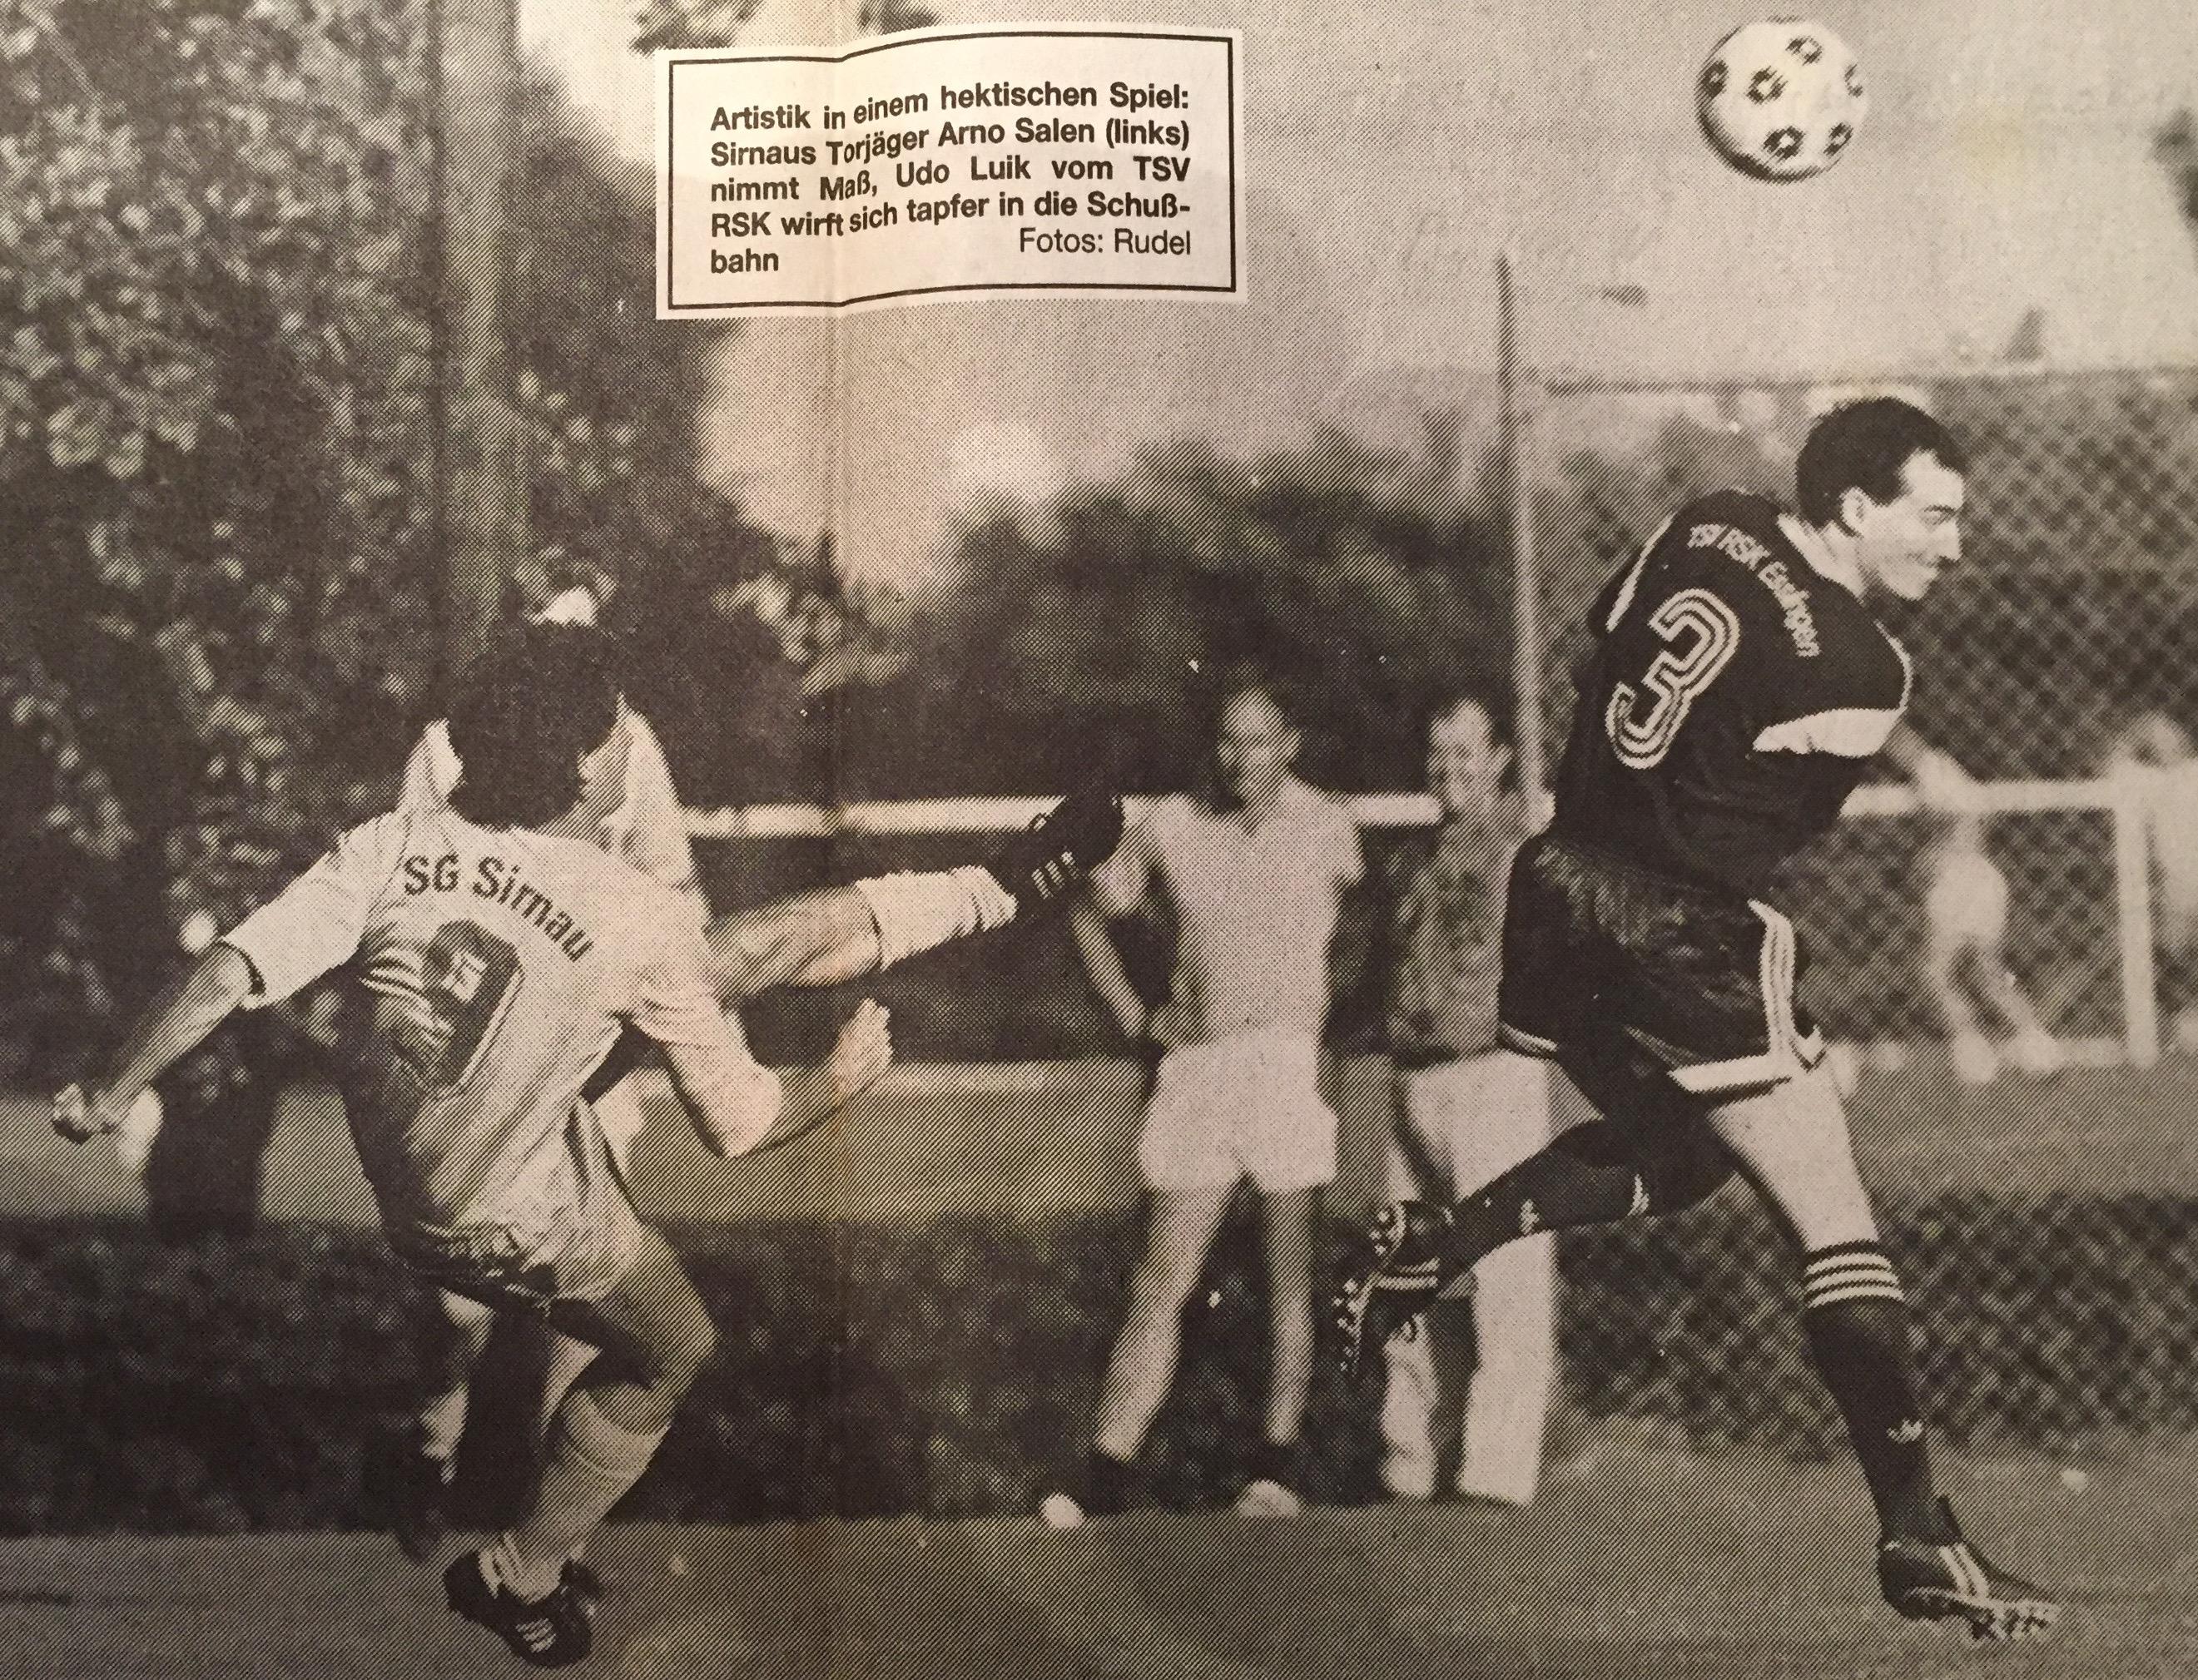 IMG_8168 EZ Pokal 1990 Udo Luik